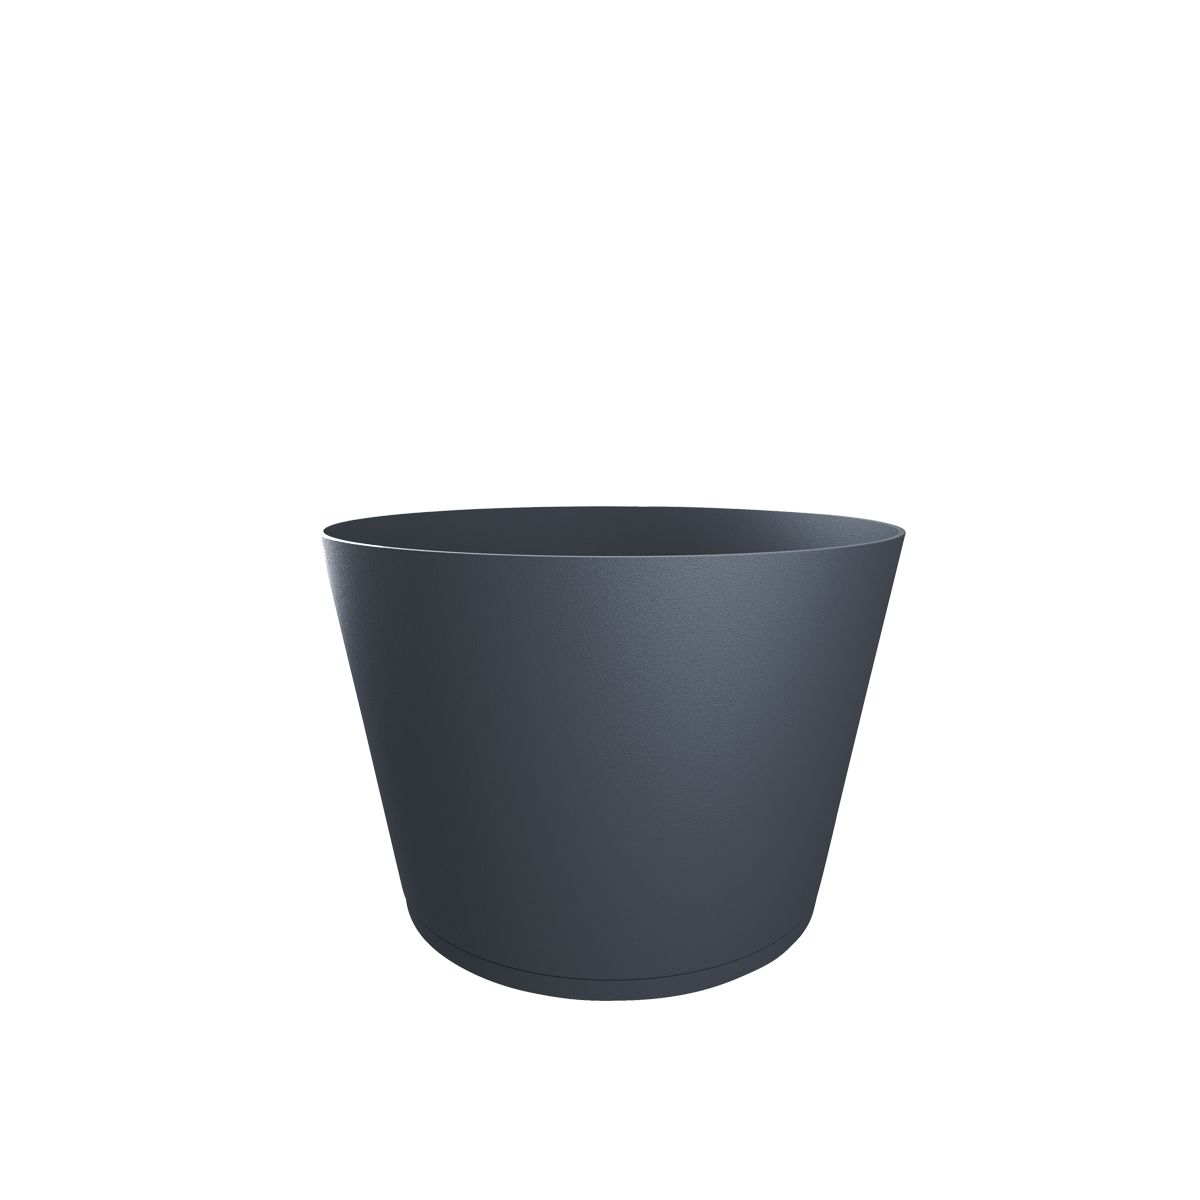 Pot De Fleur Design Tokyo 50 Cm Grosfillex